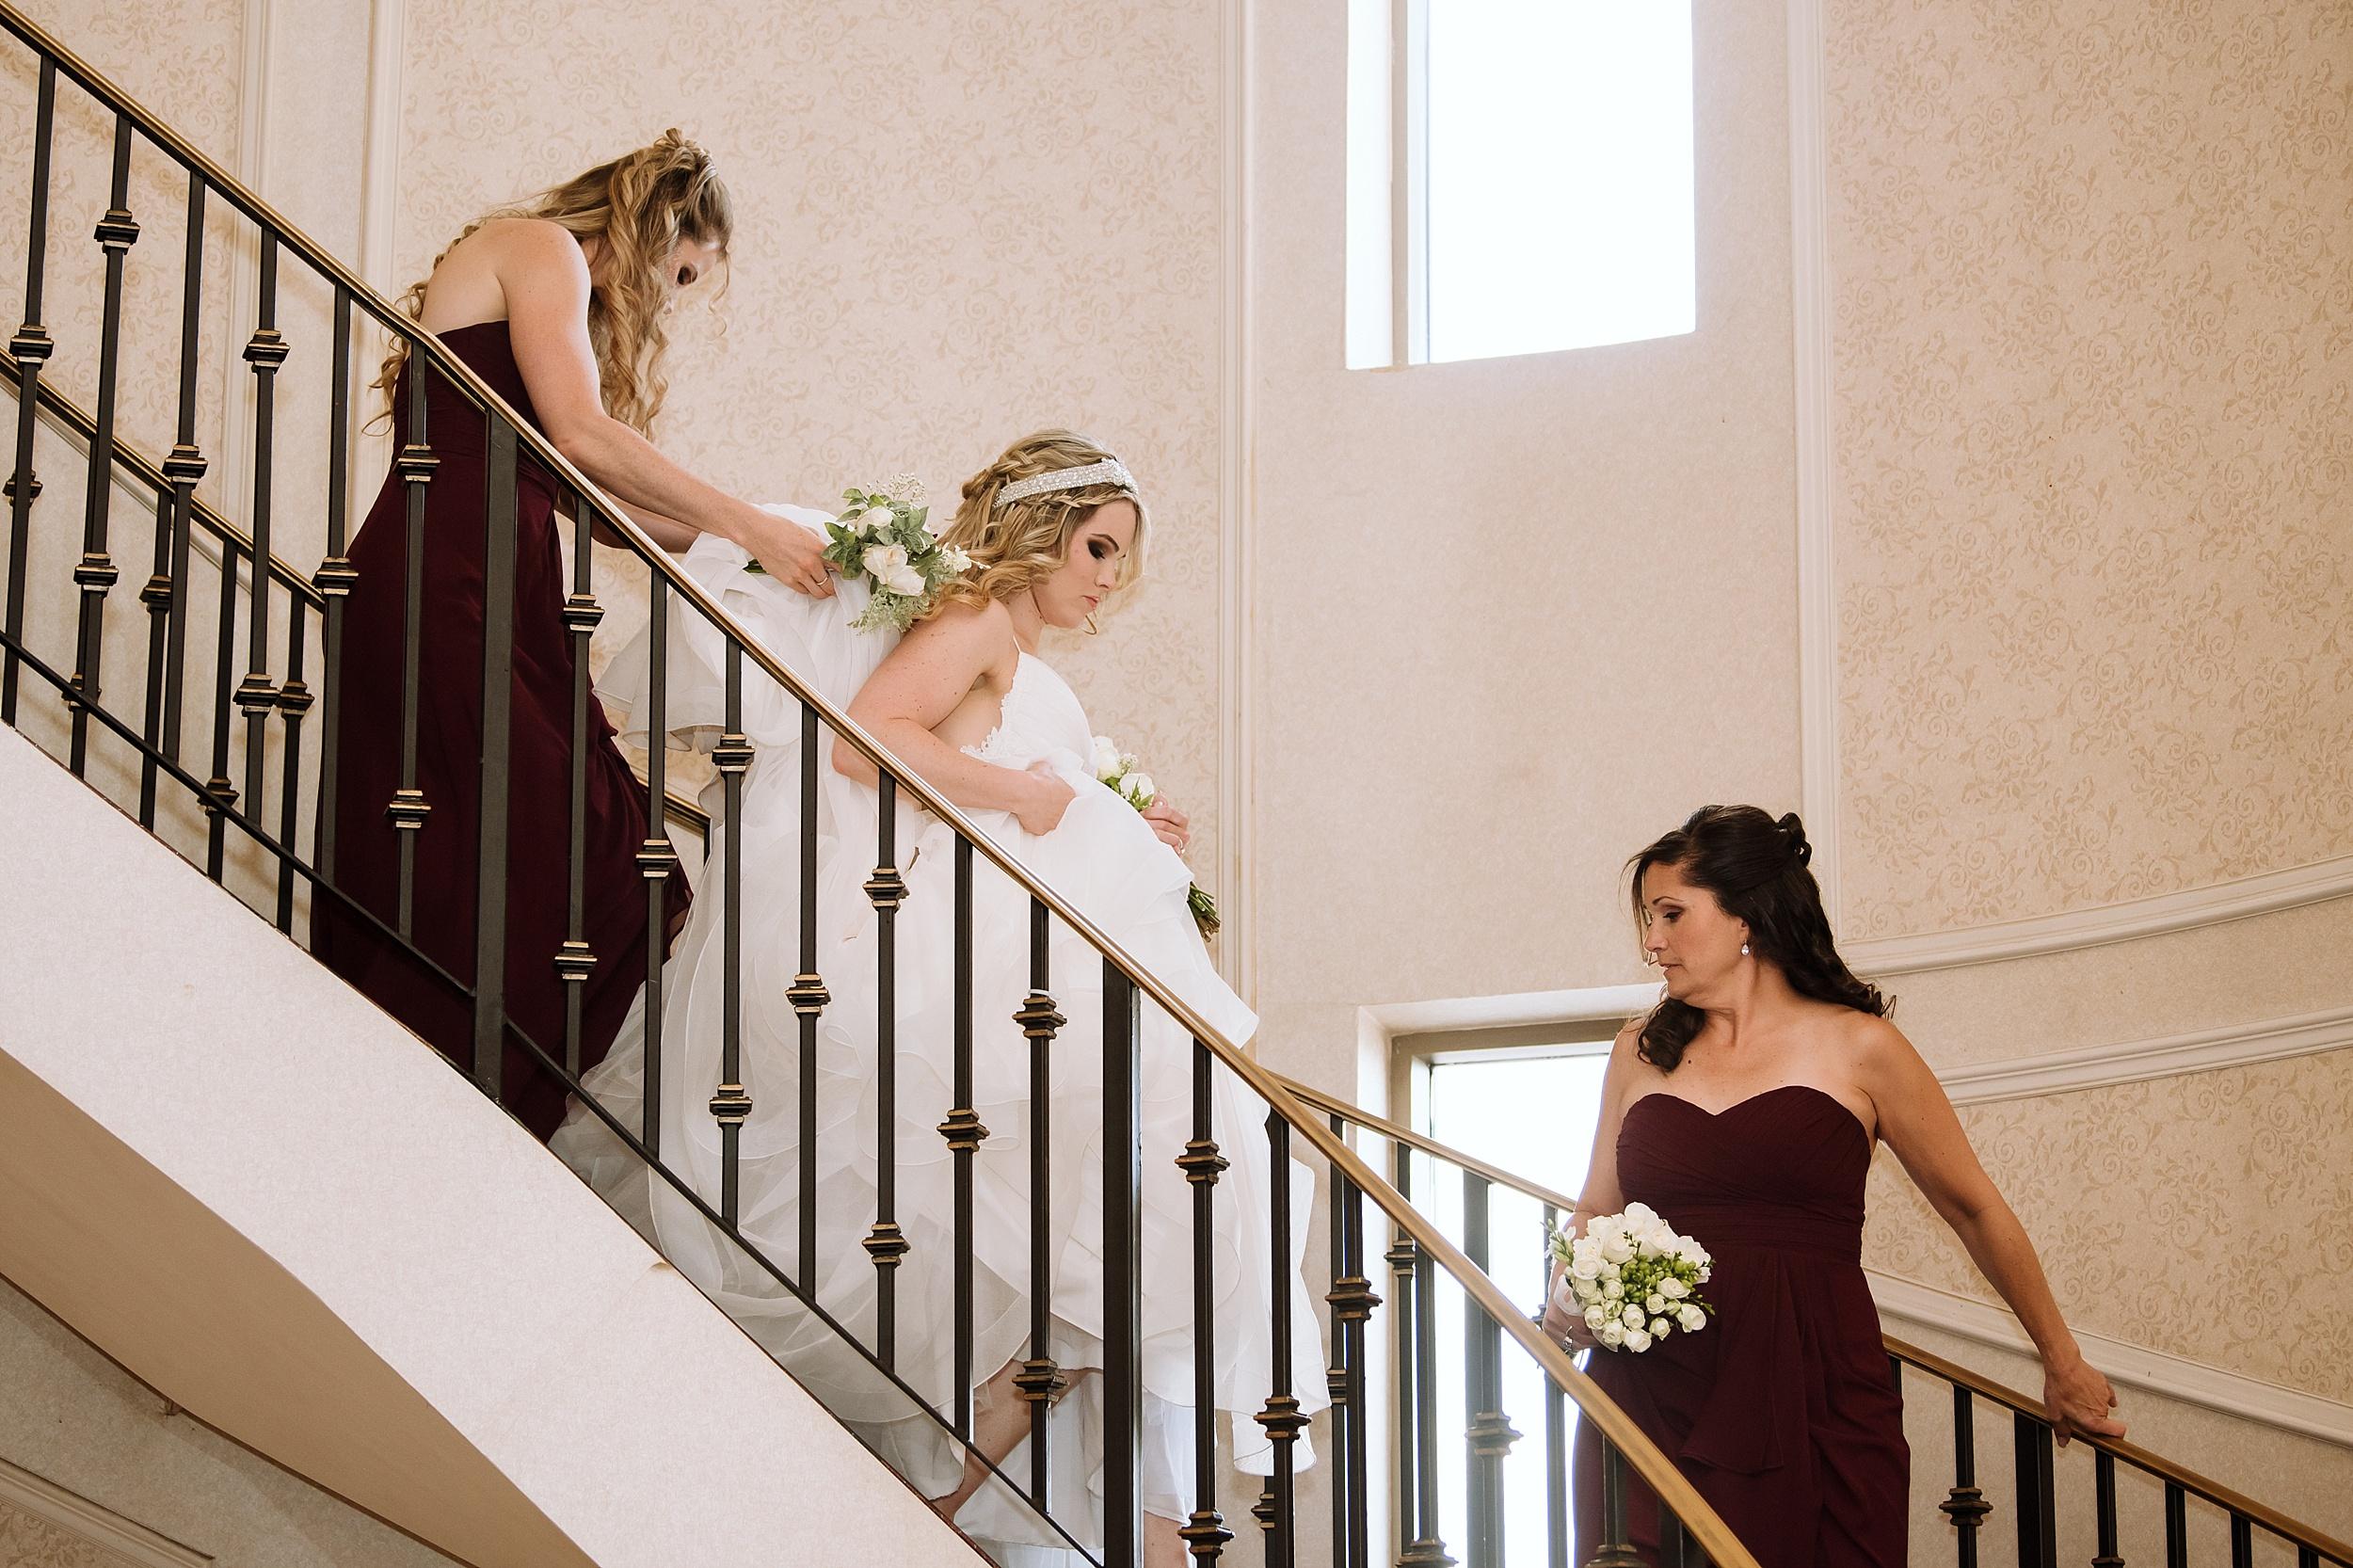 McMichael_Art_Collection_Wedding_chateau_le_jardin_Justine_Munro_Toronto_Photographer048.jpg